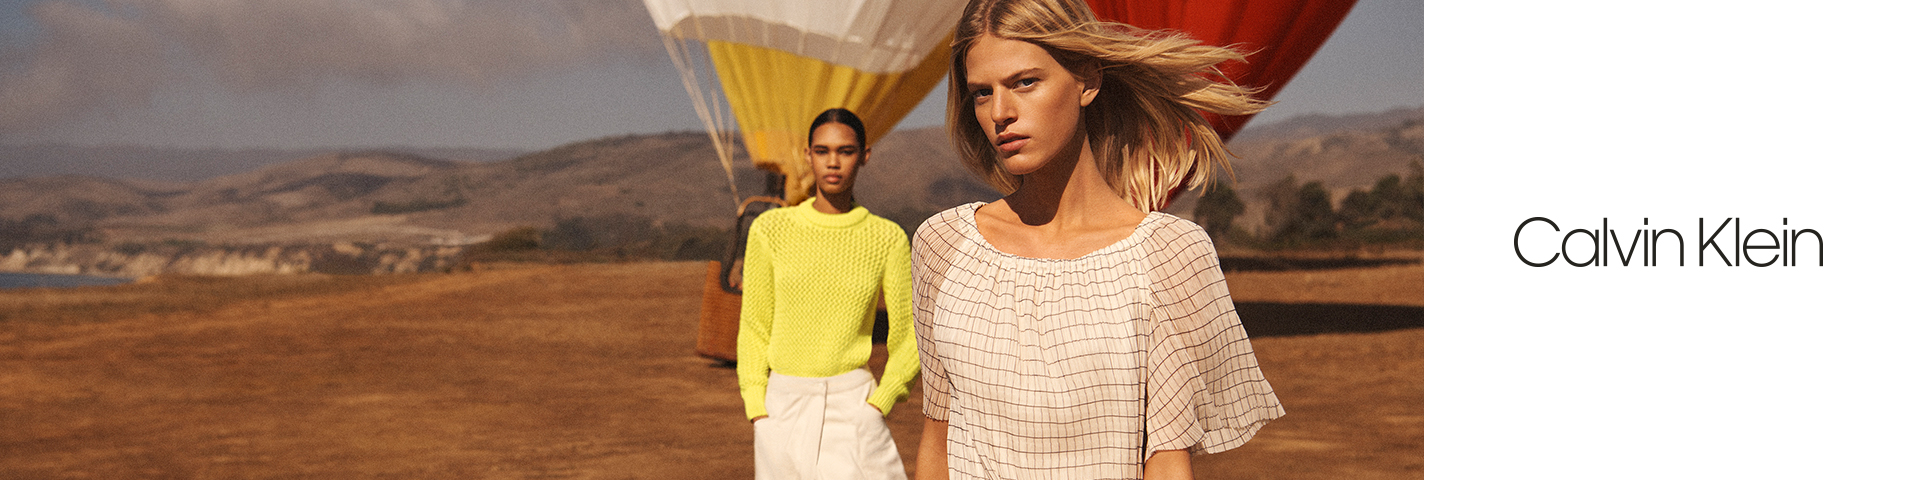 new styles 8f6fd 9924e Sko, tøj og accessories fra Calvin Klein